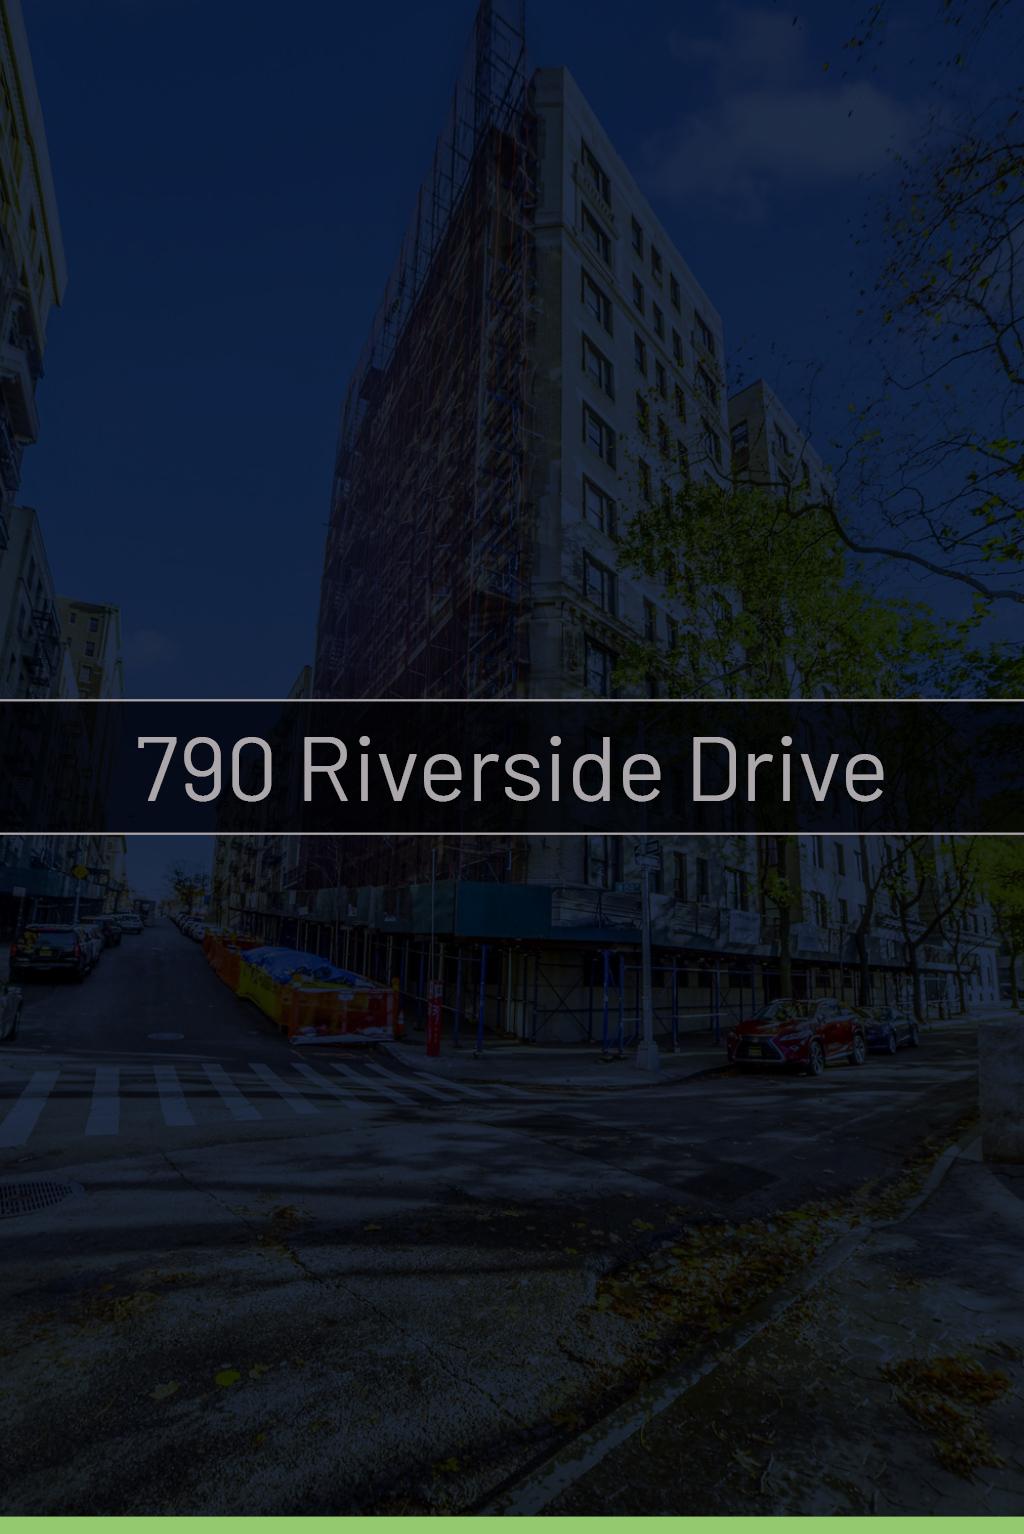 790RiversideDrive